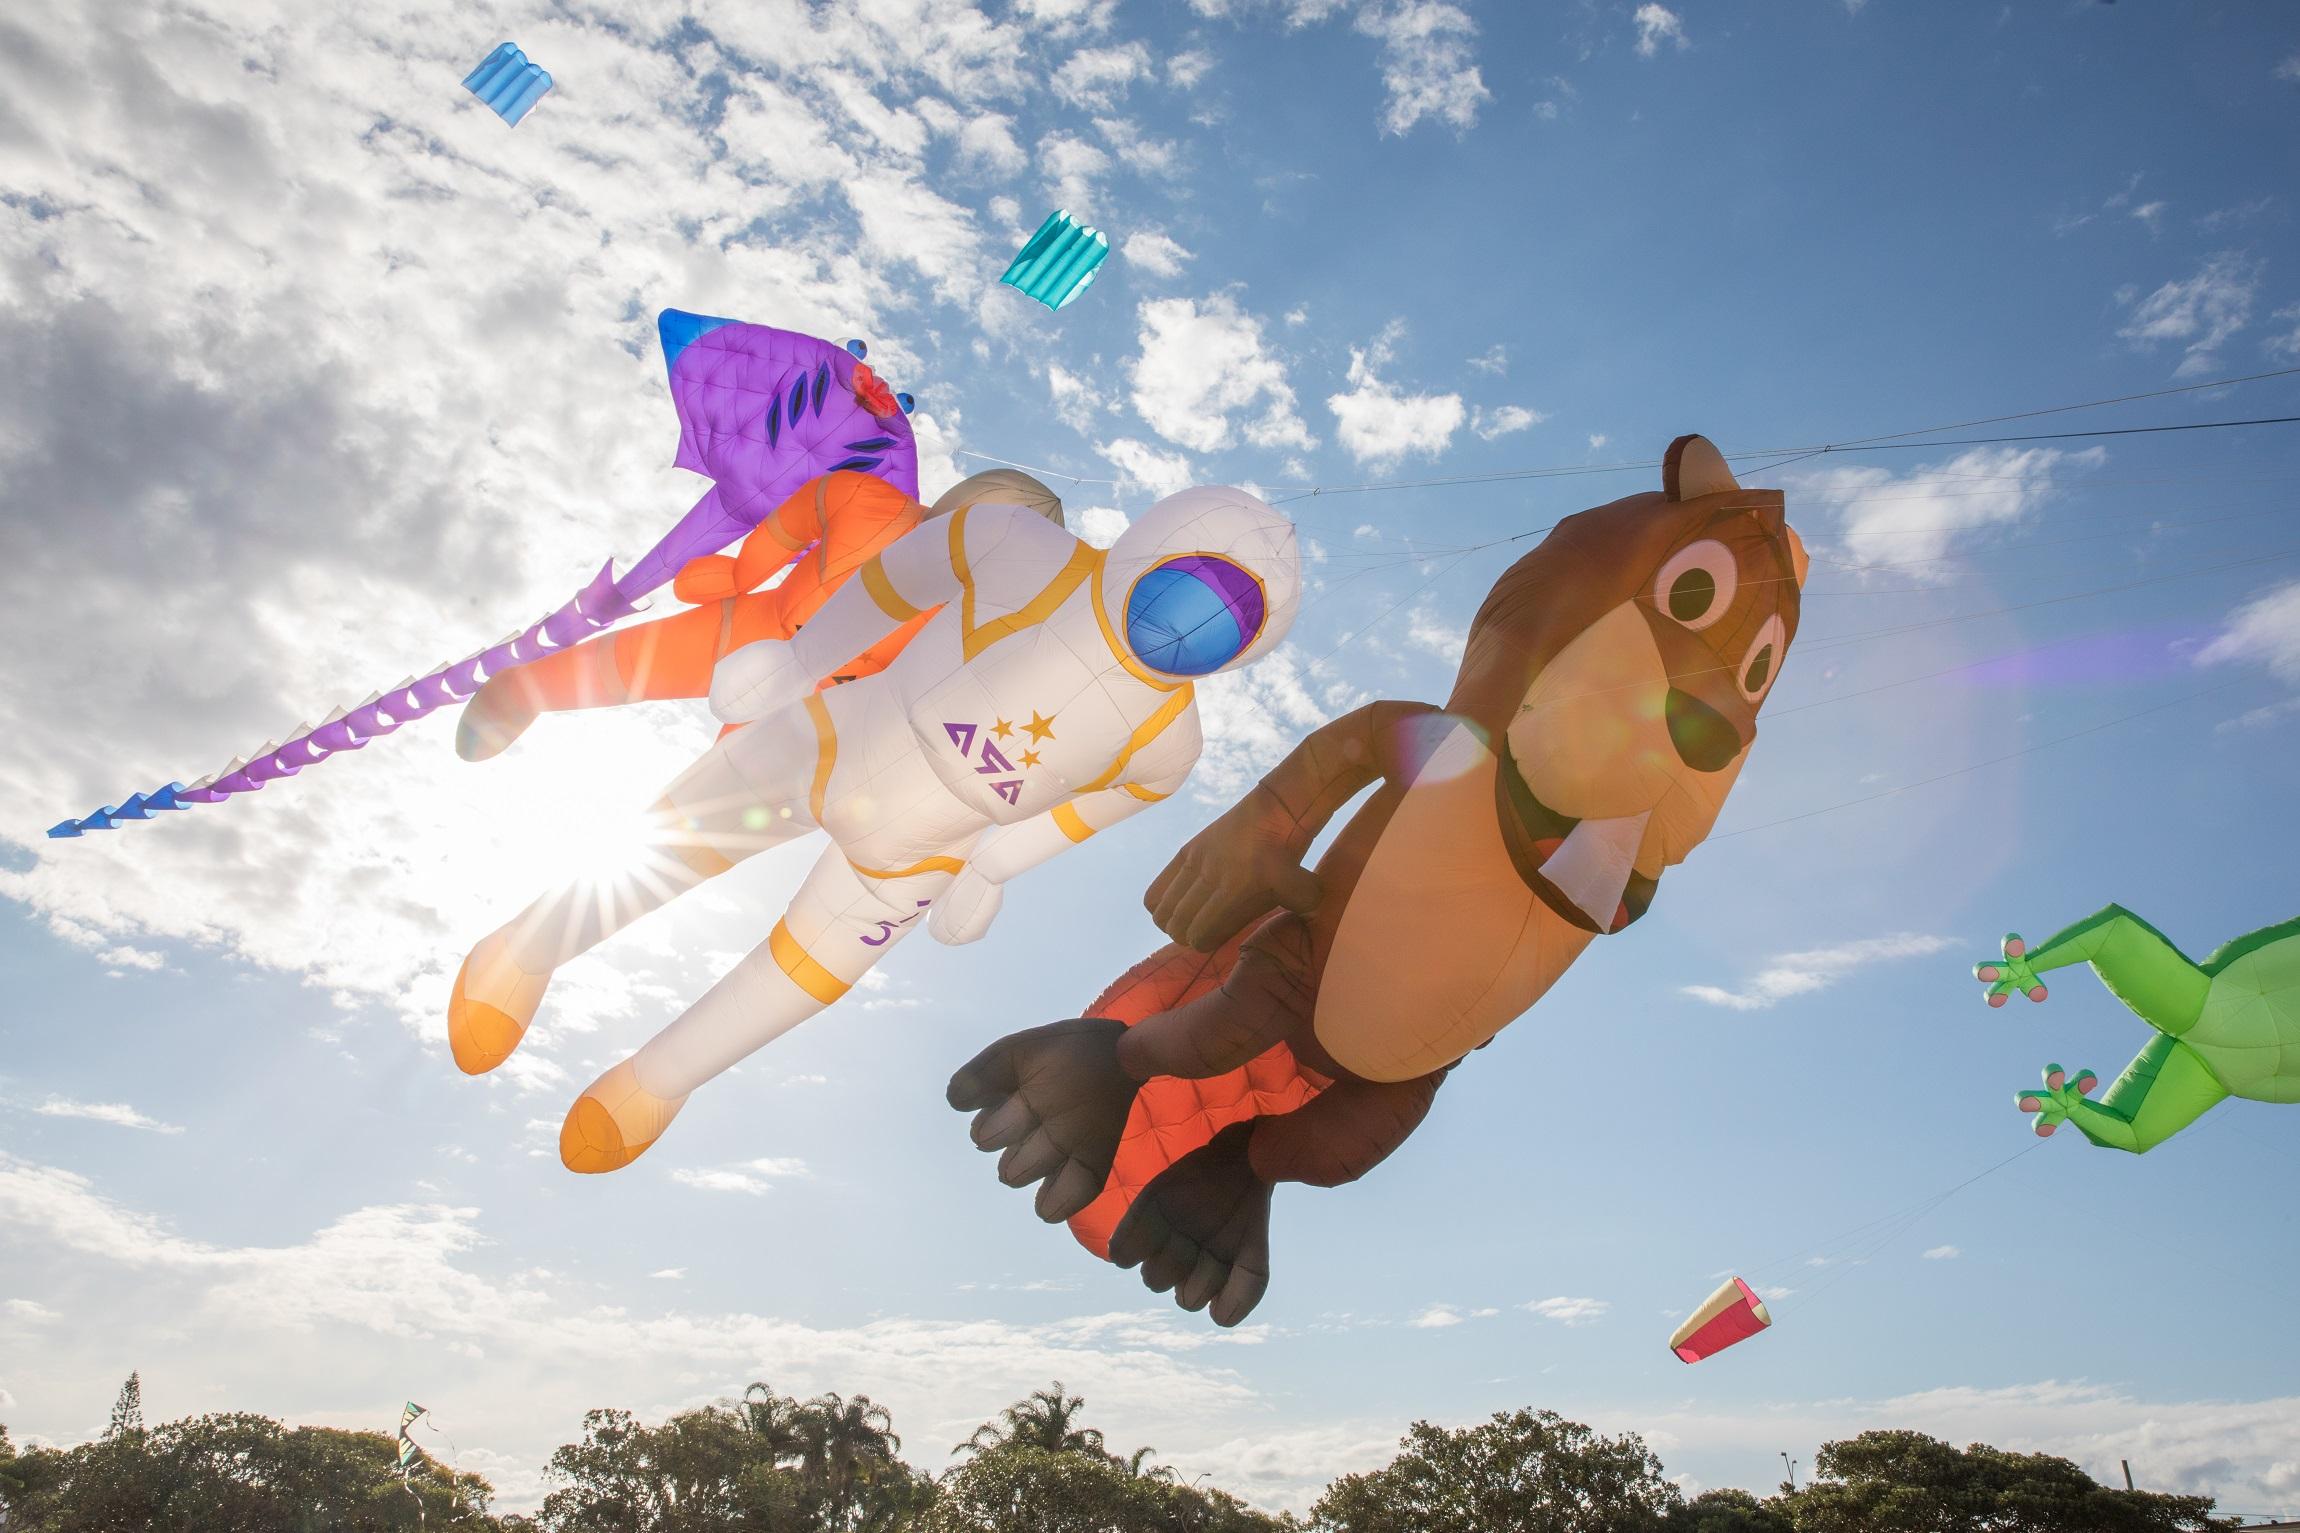 Redcliffe KiteFest International Kite Displays